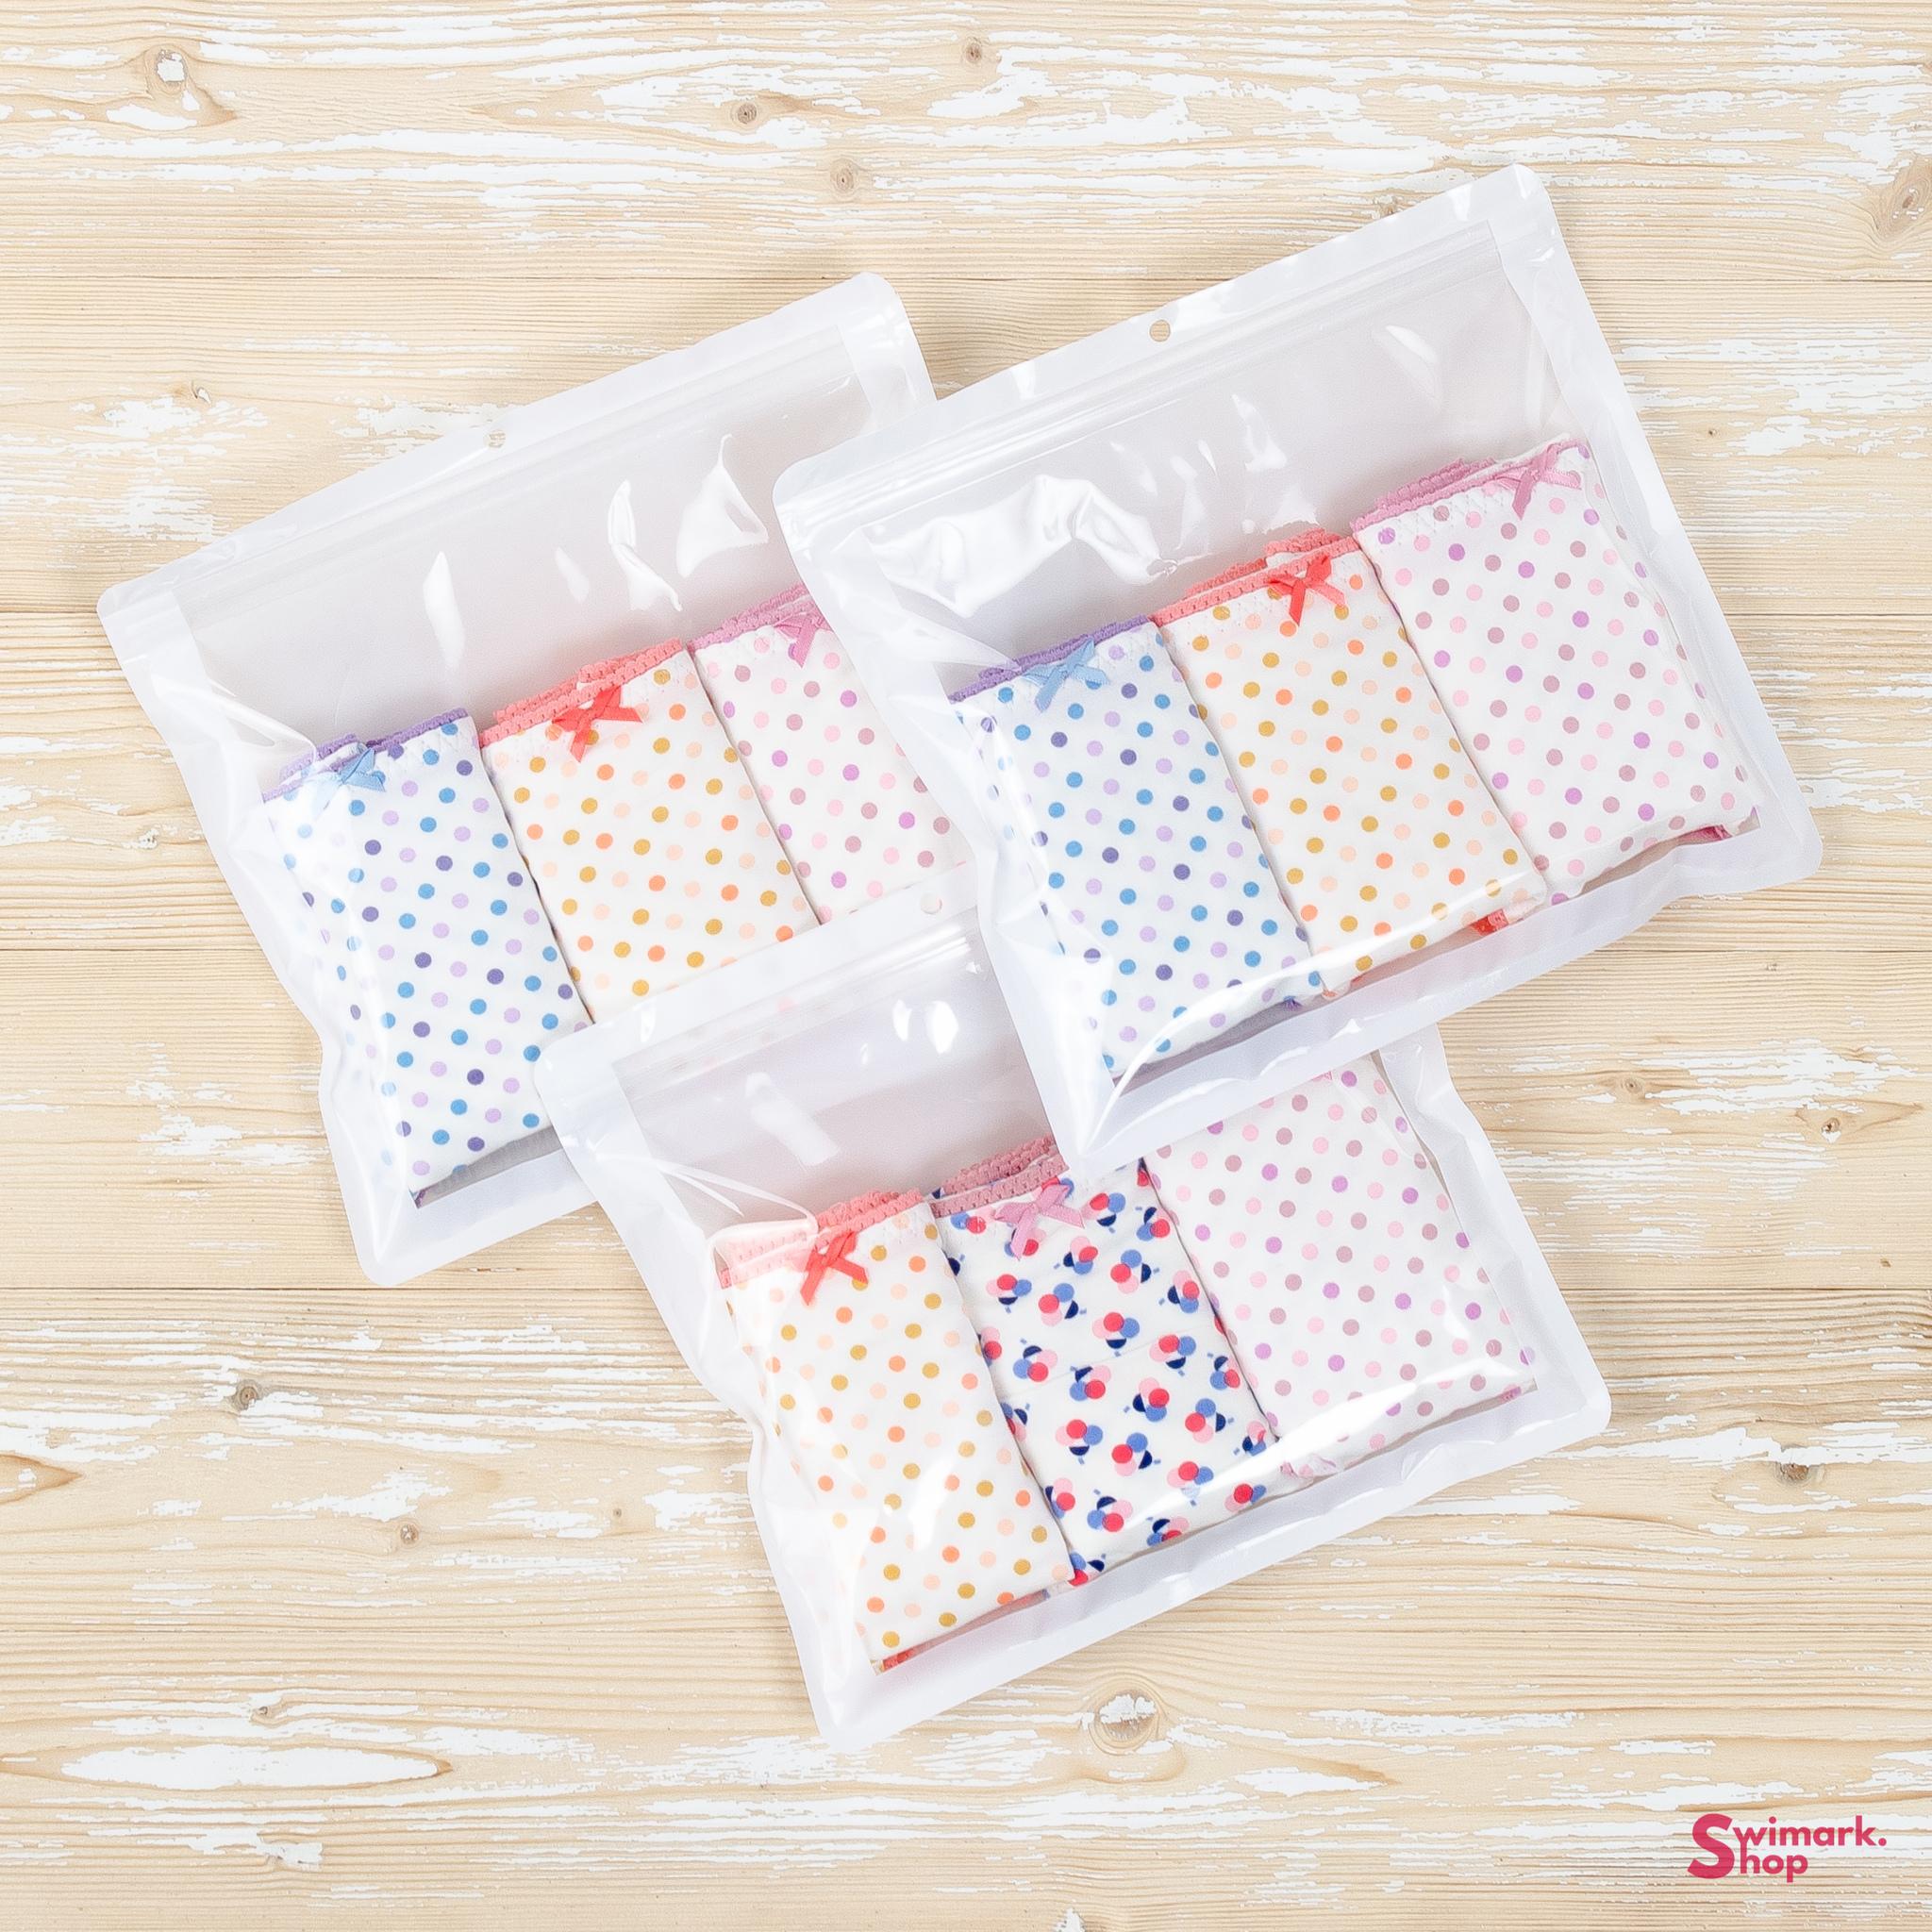 NEW Трусики женские Little Secret 9018, 3 шт. в упаковке swimarkshop-8036.jpg